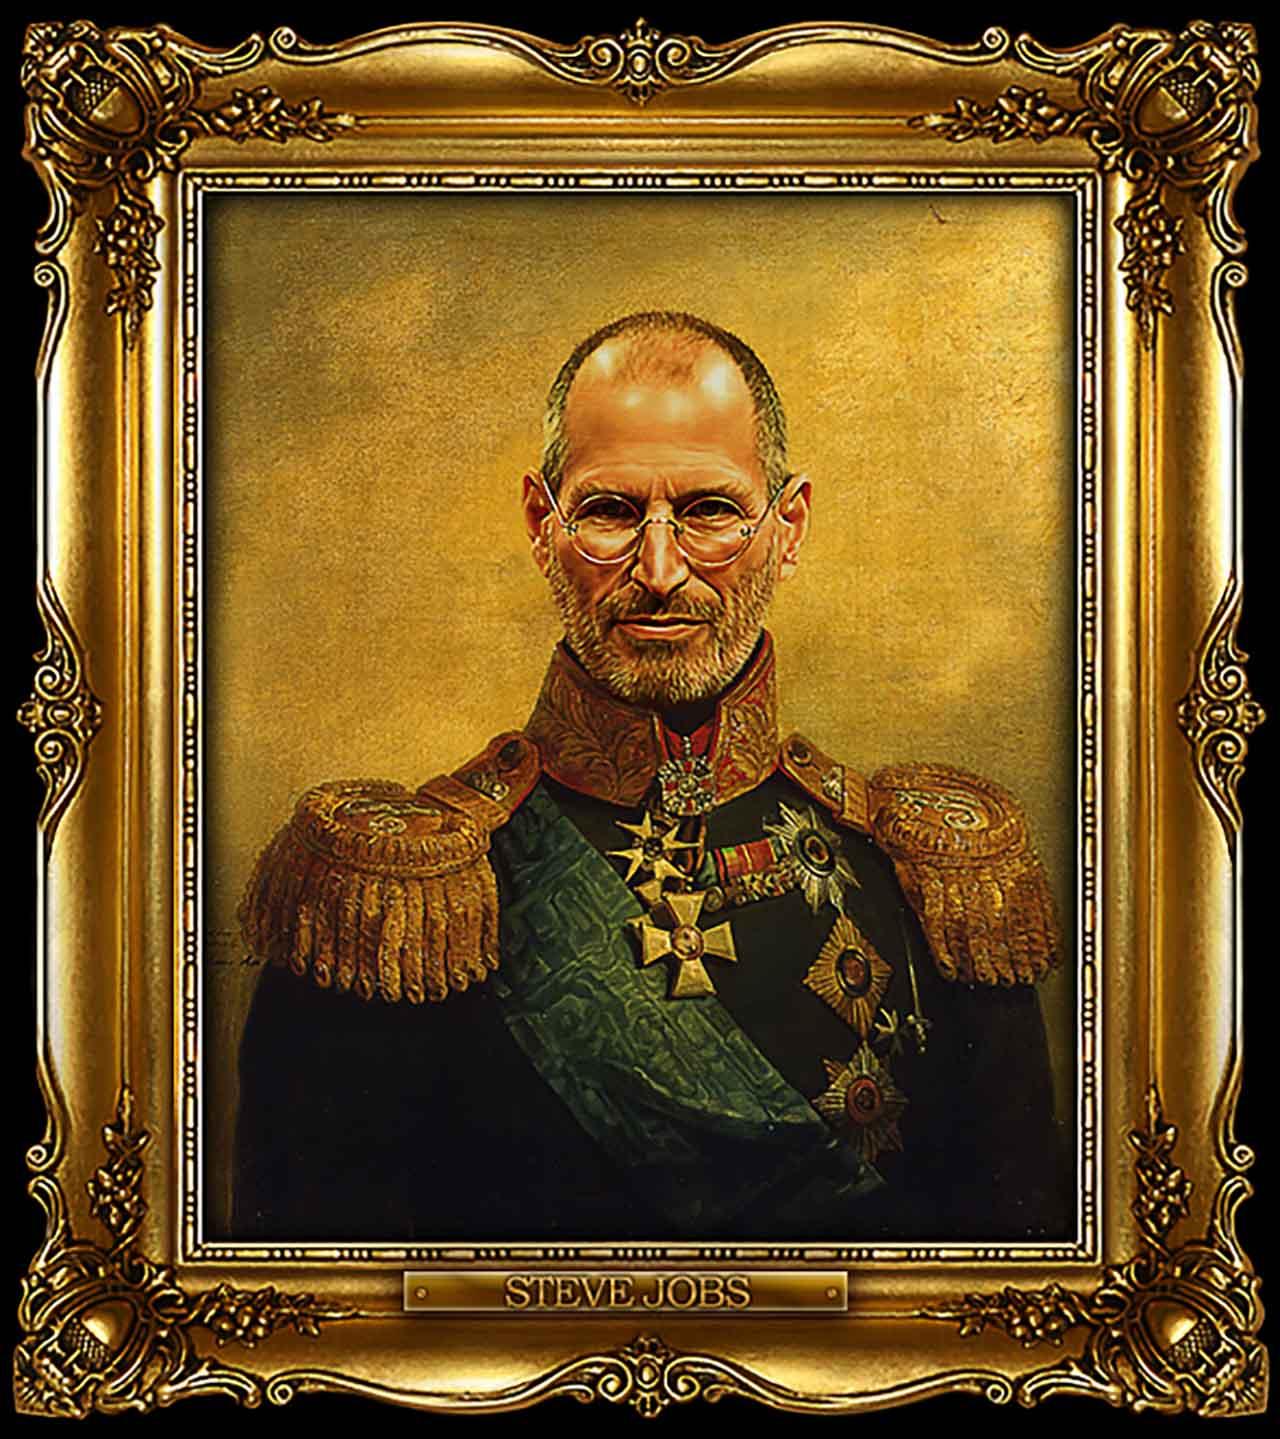 Artist Turns Famous Actors Into Russian Generals - Steve Jobs